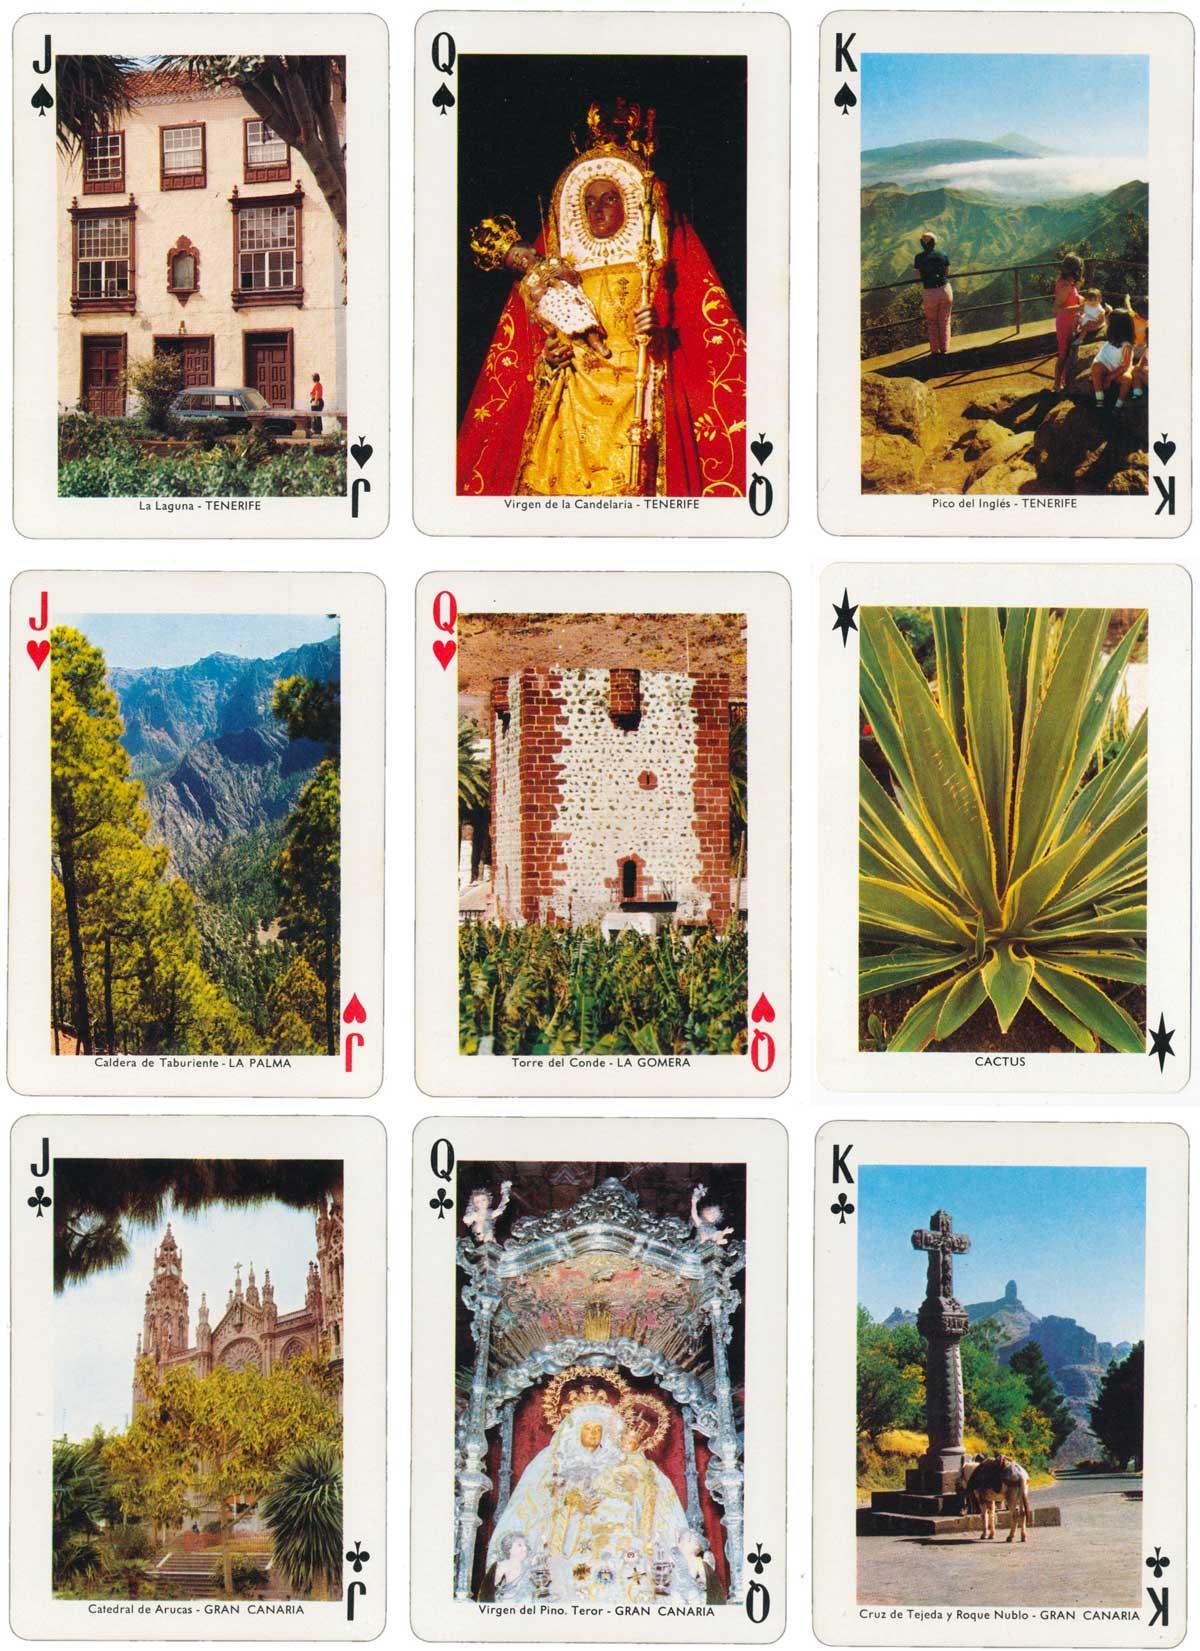 Canary Islands Souvenir by Heraclio Fournier, c.1970